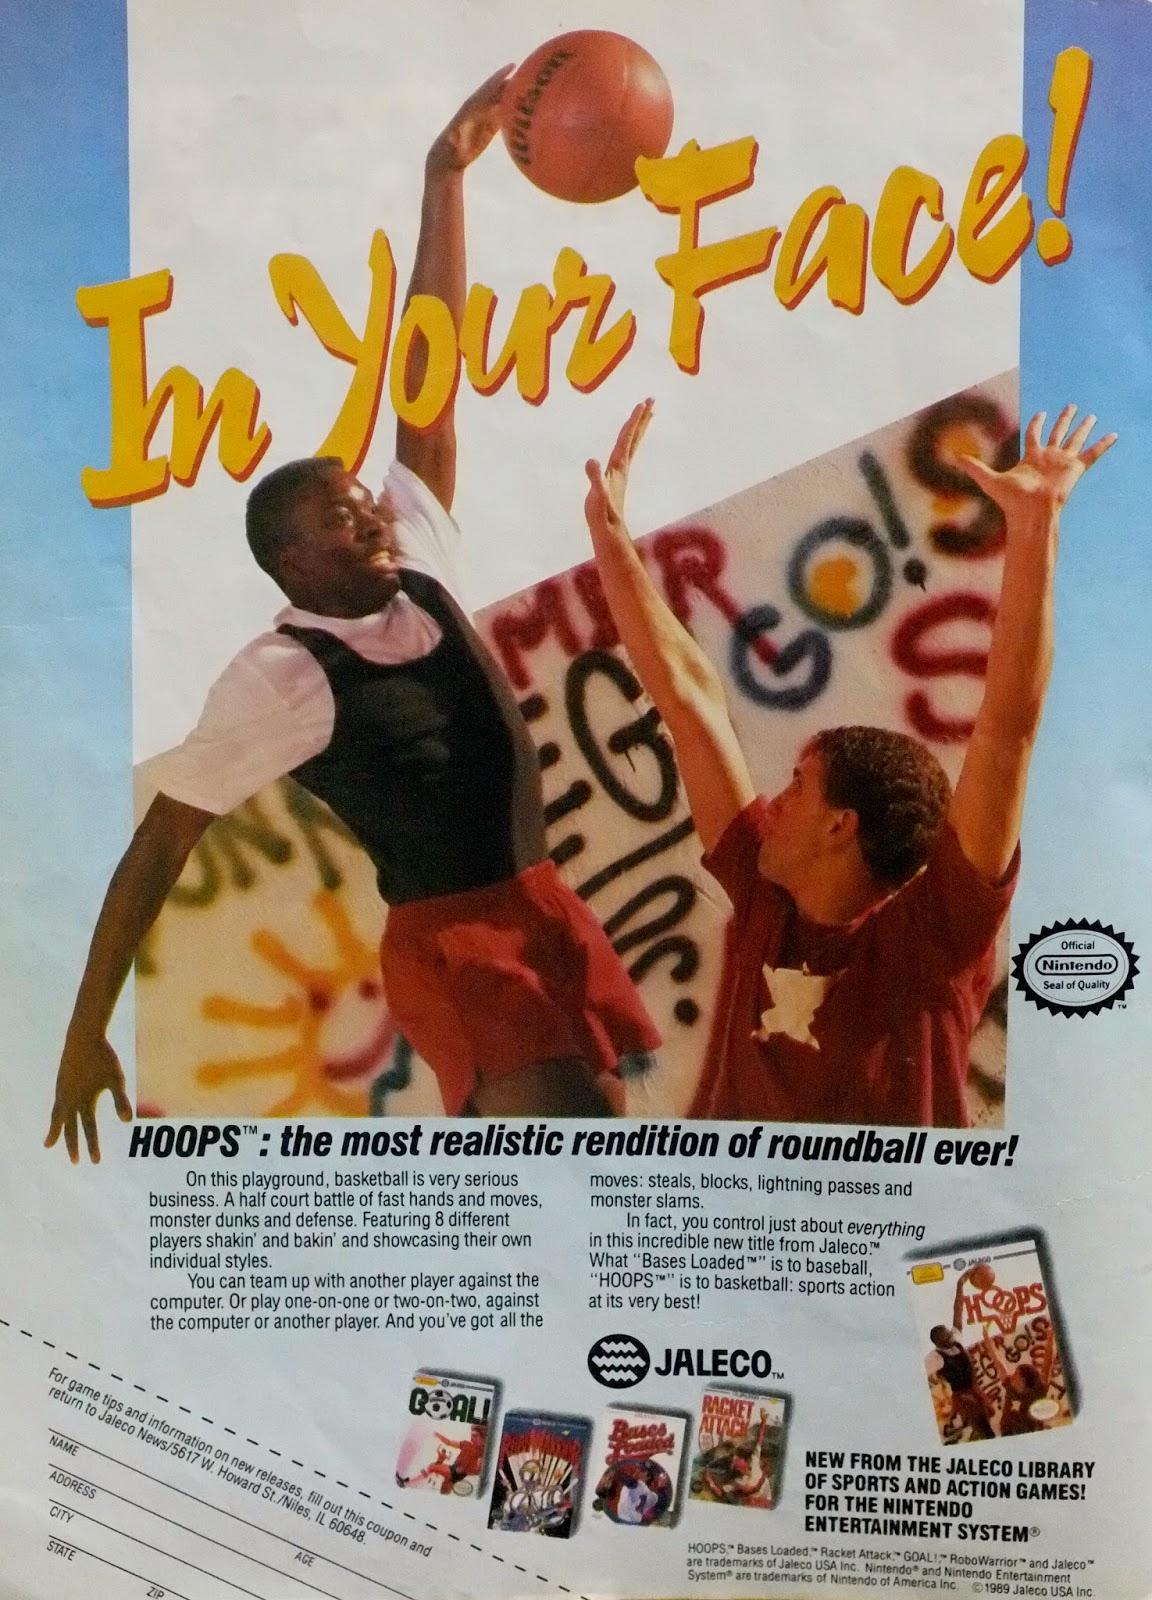 Hoops for NES advertisement